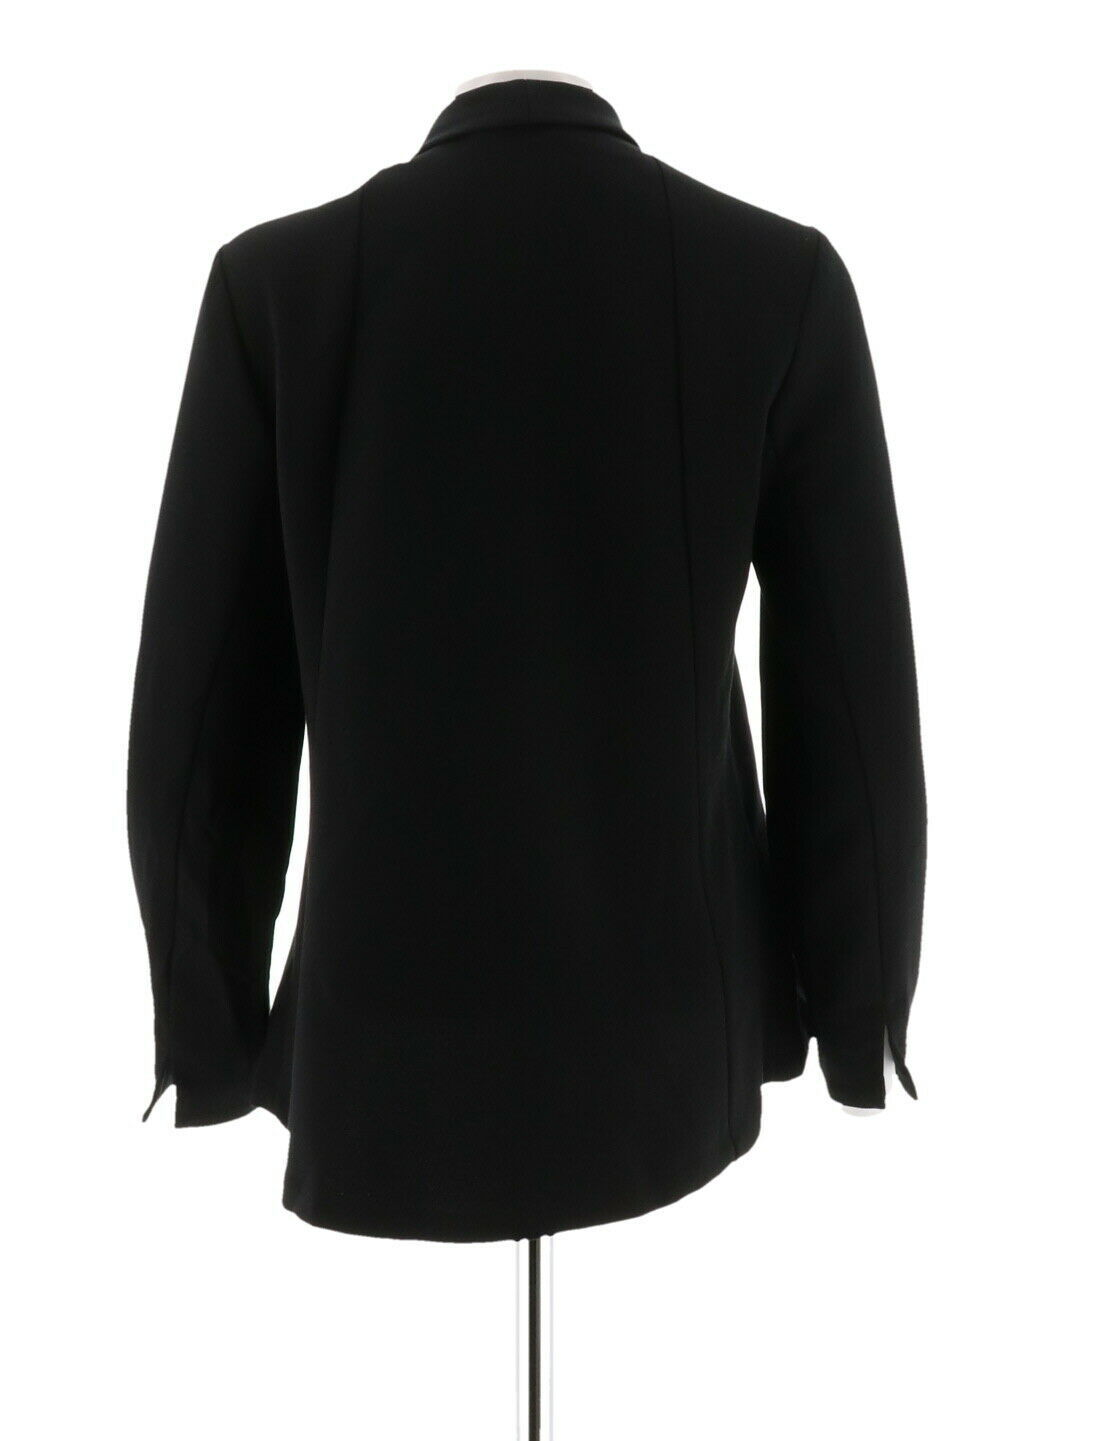 H Halston Long Slv Open Front Jacket Seam Black 12 NEW A303200 image 3